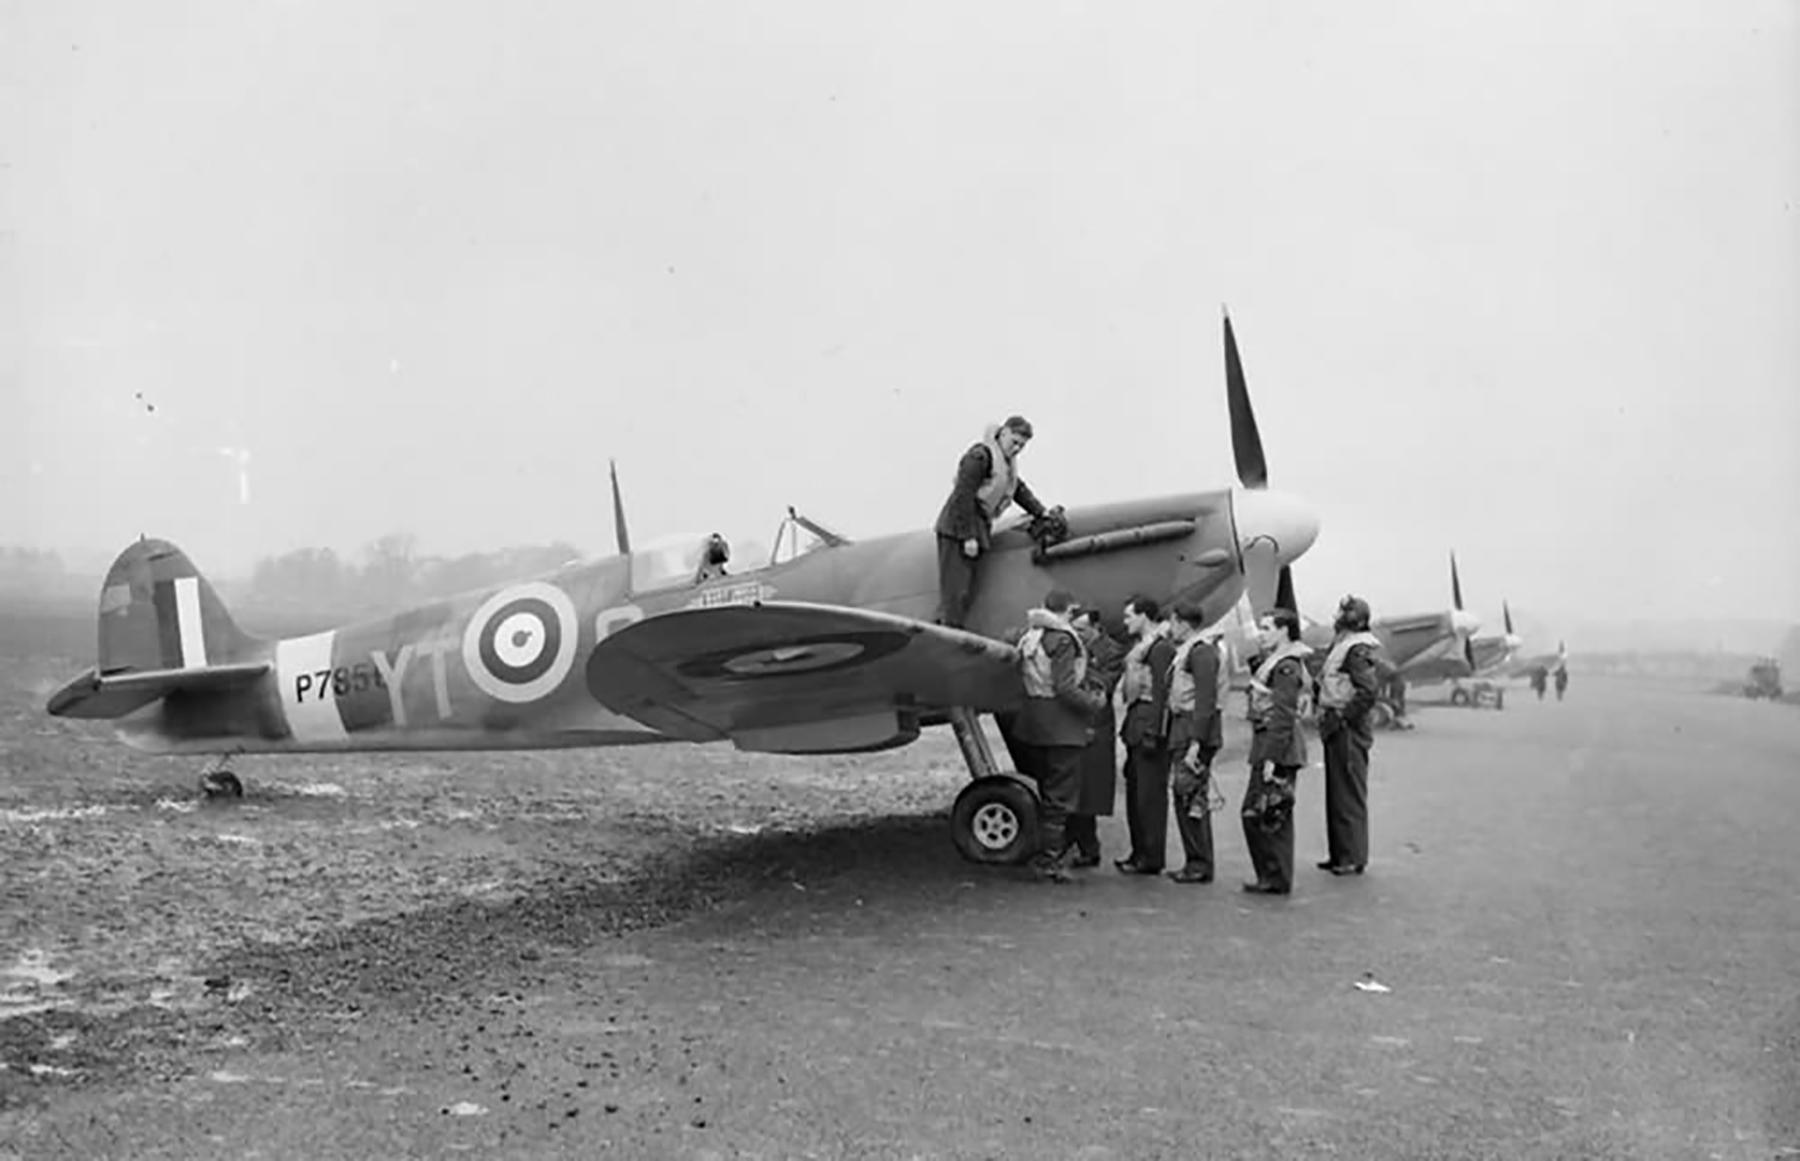 Spitfire MkIIa RAF 65Sqn YTO P7856 at Tangmere England 1941 web 01